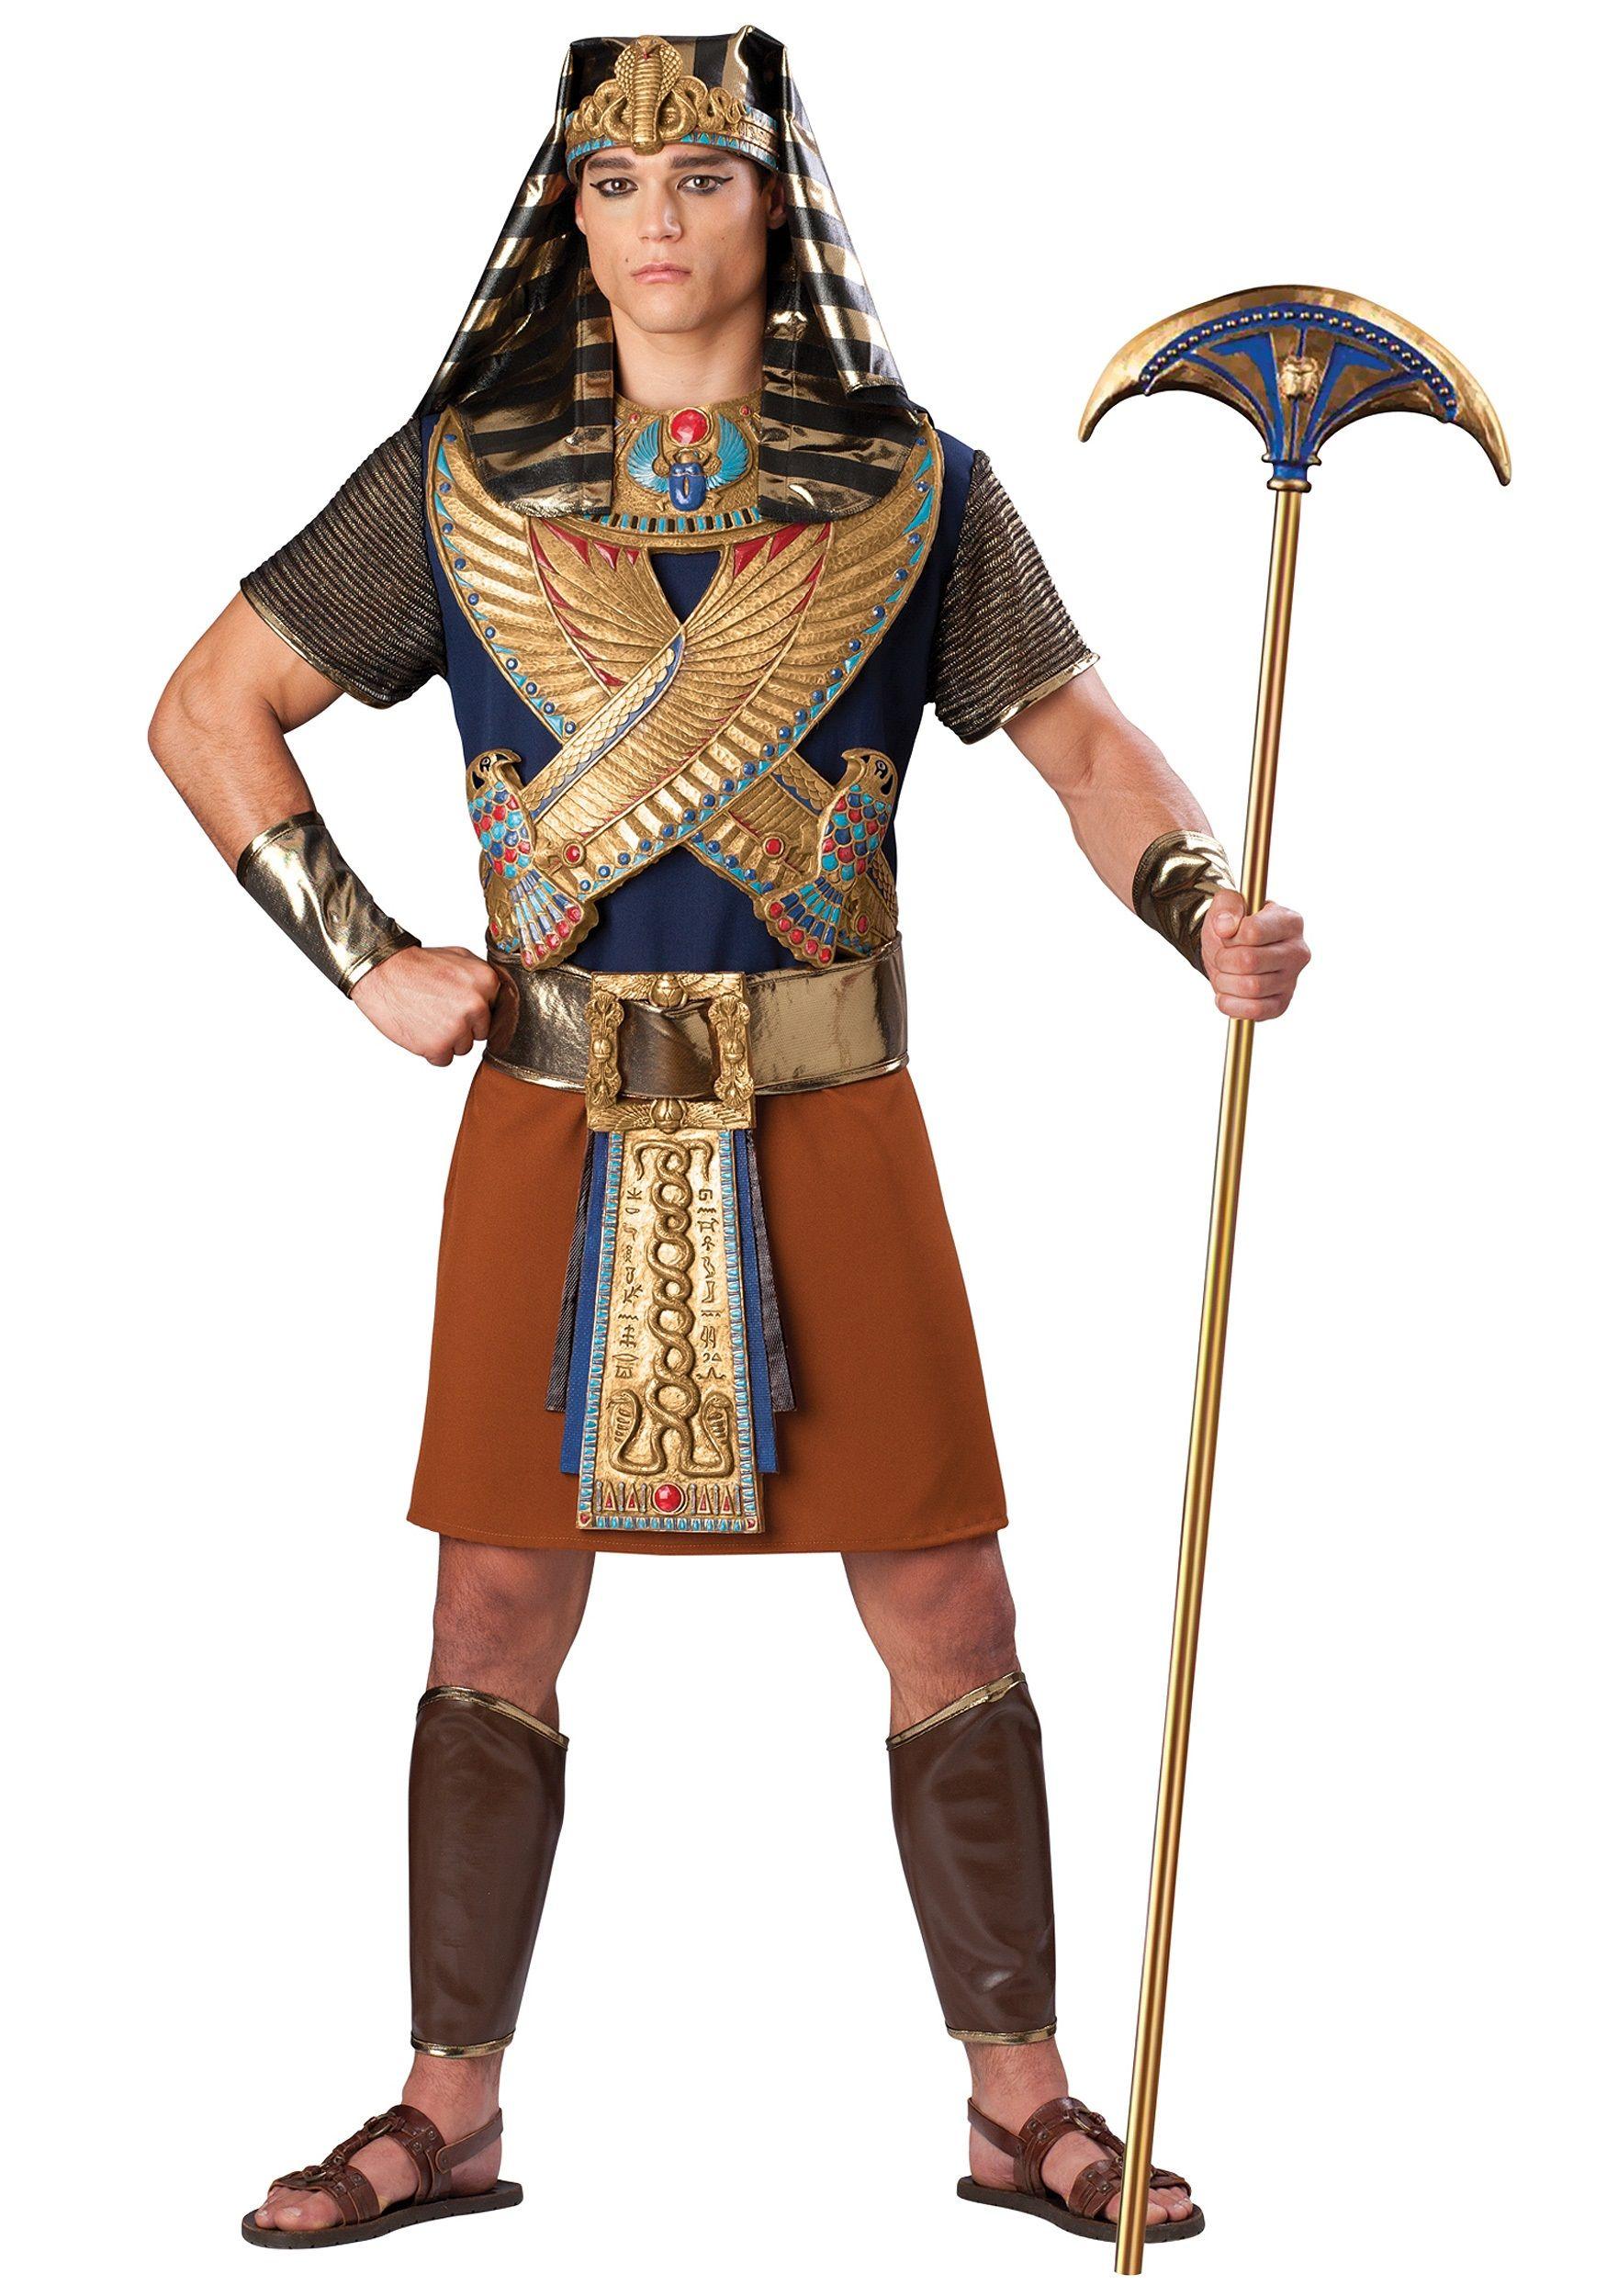 cleopatra dog costume - Google Search | MODA PARA HOMBRES ...